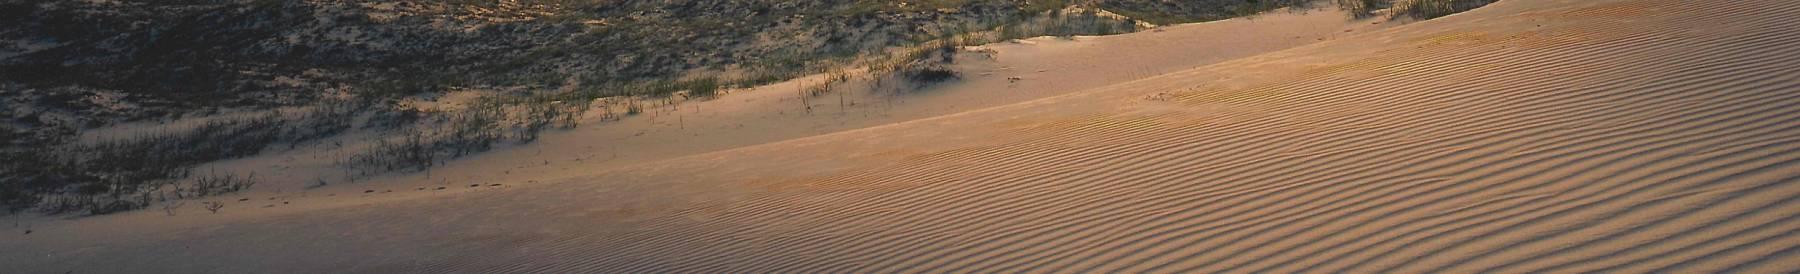 Rippled Sand Dune